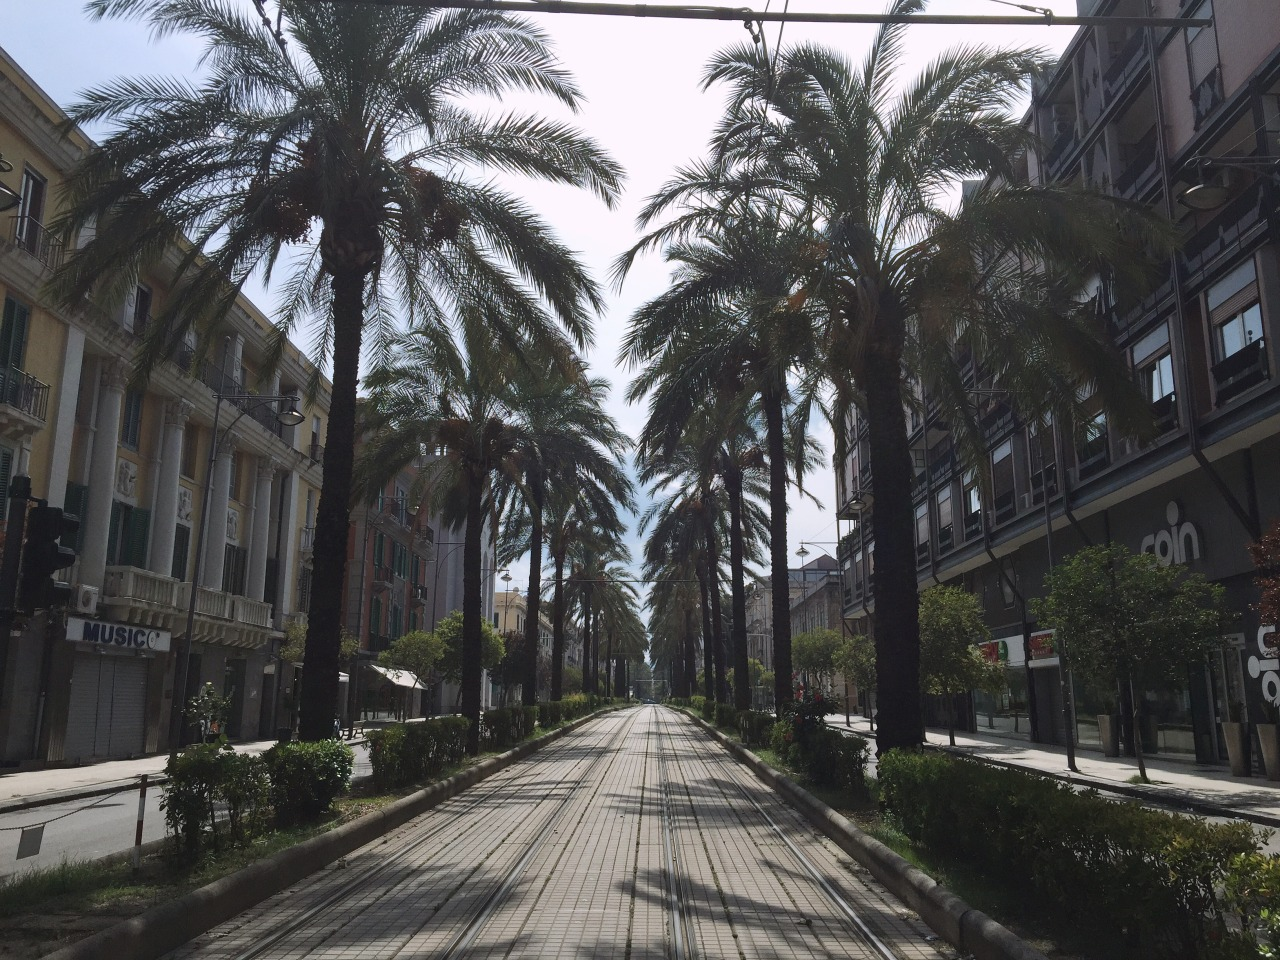 Day 8: Messina